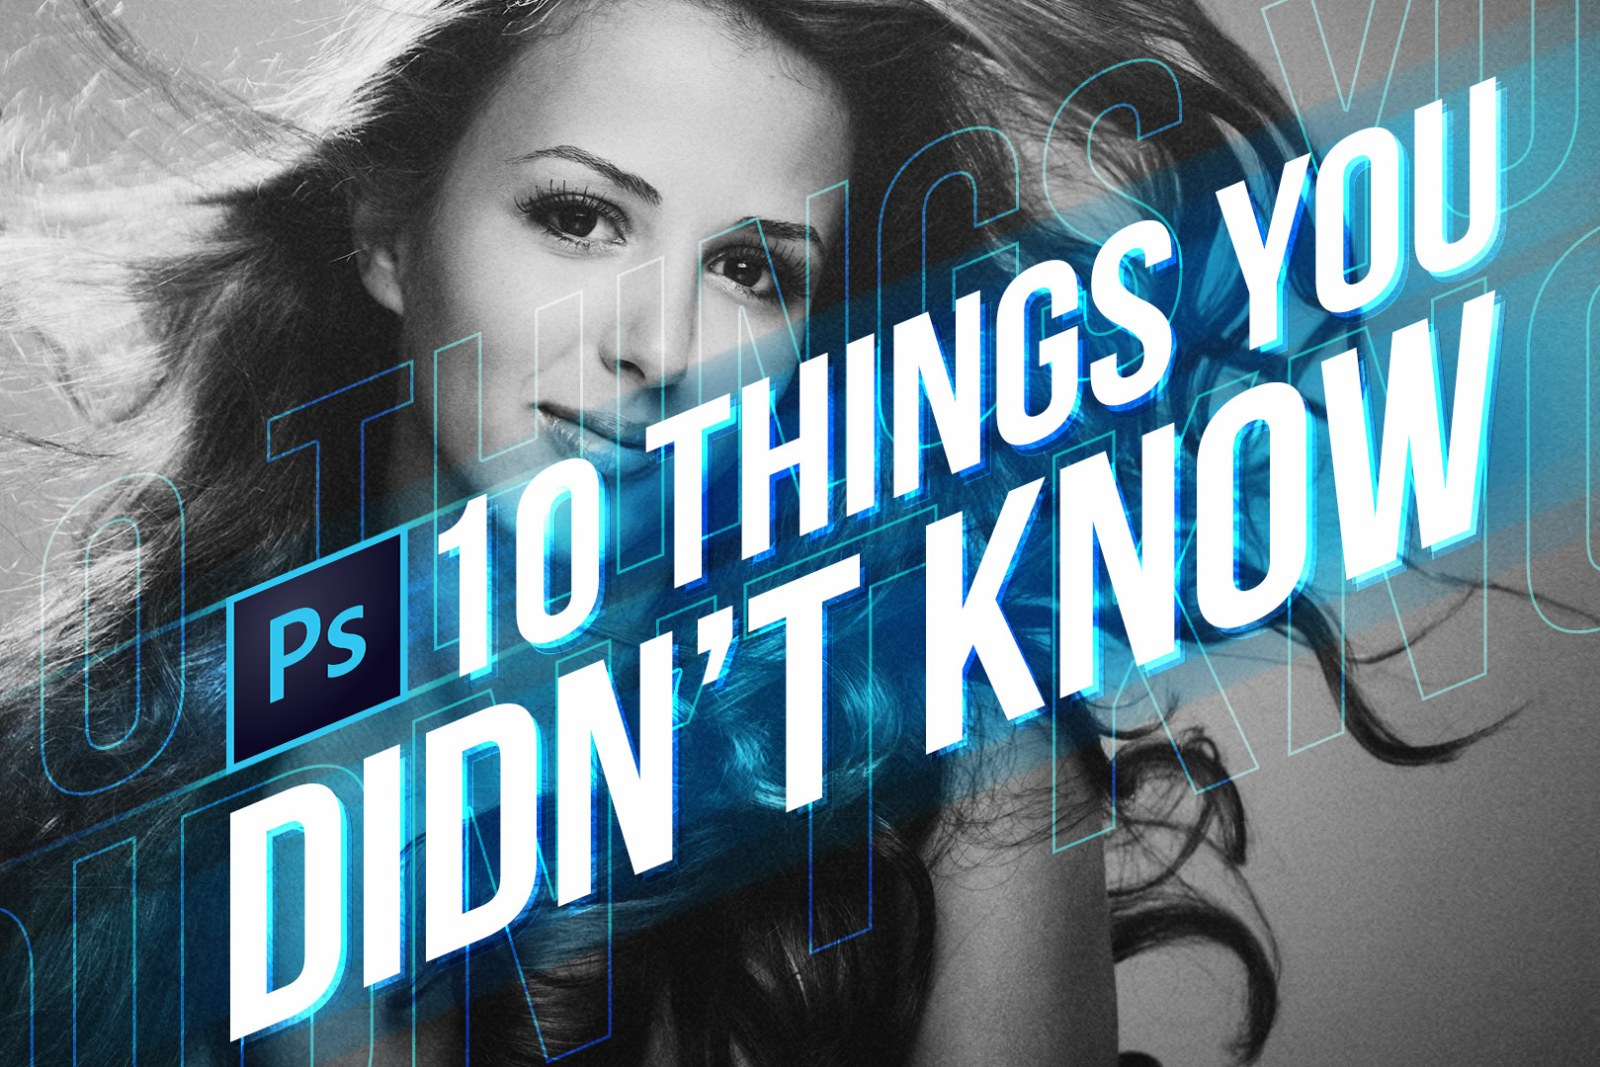 thumbnail-10-things-tutvid